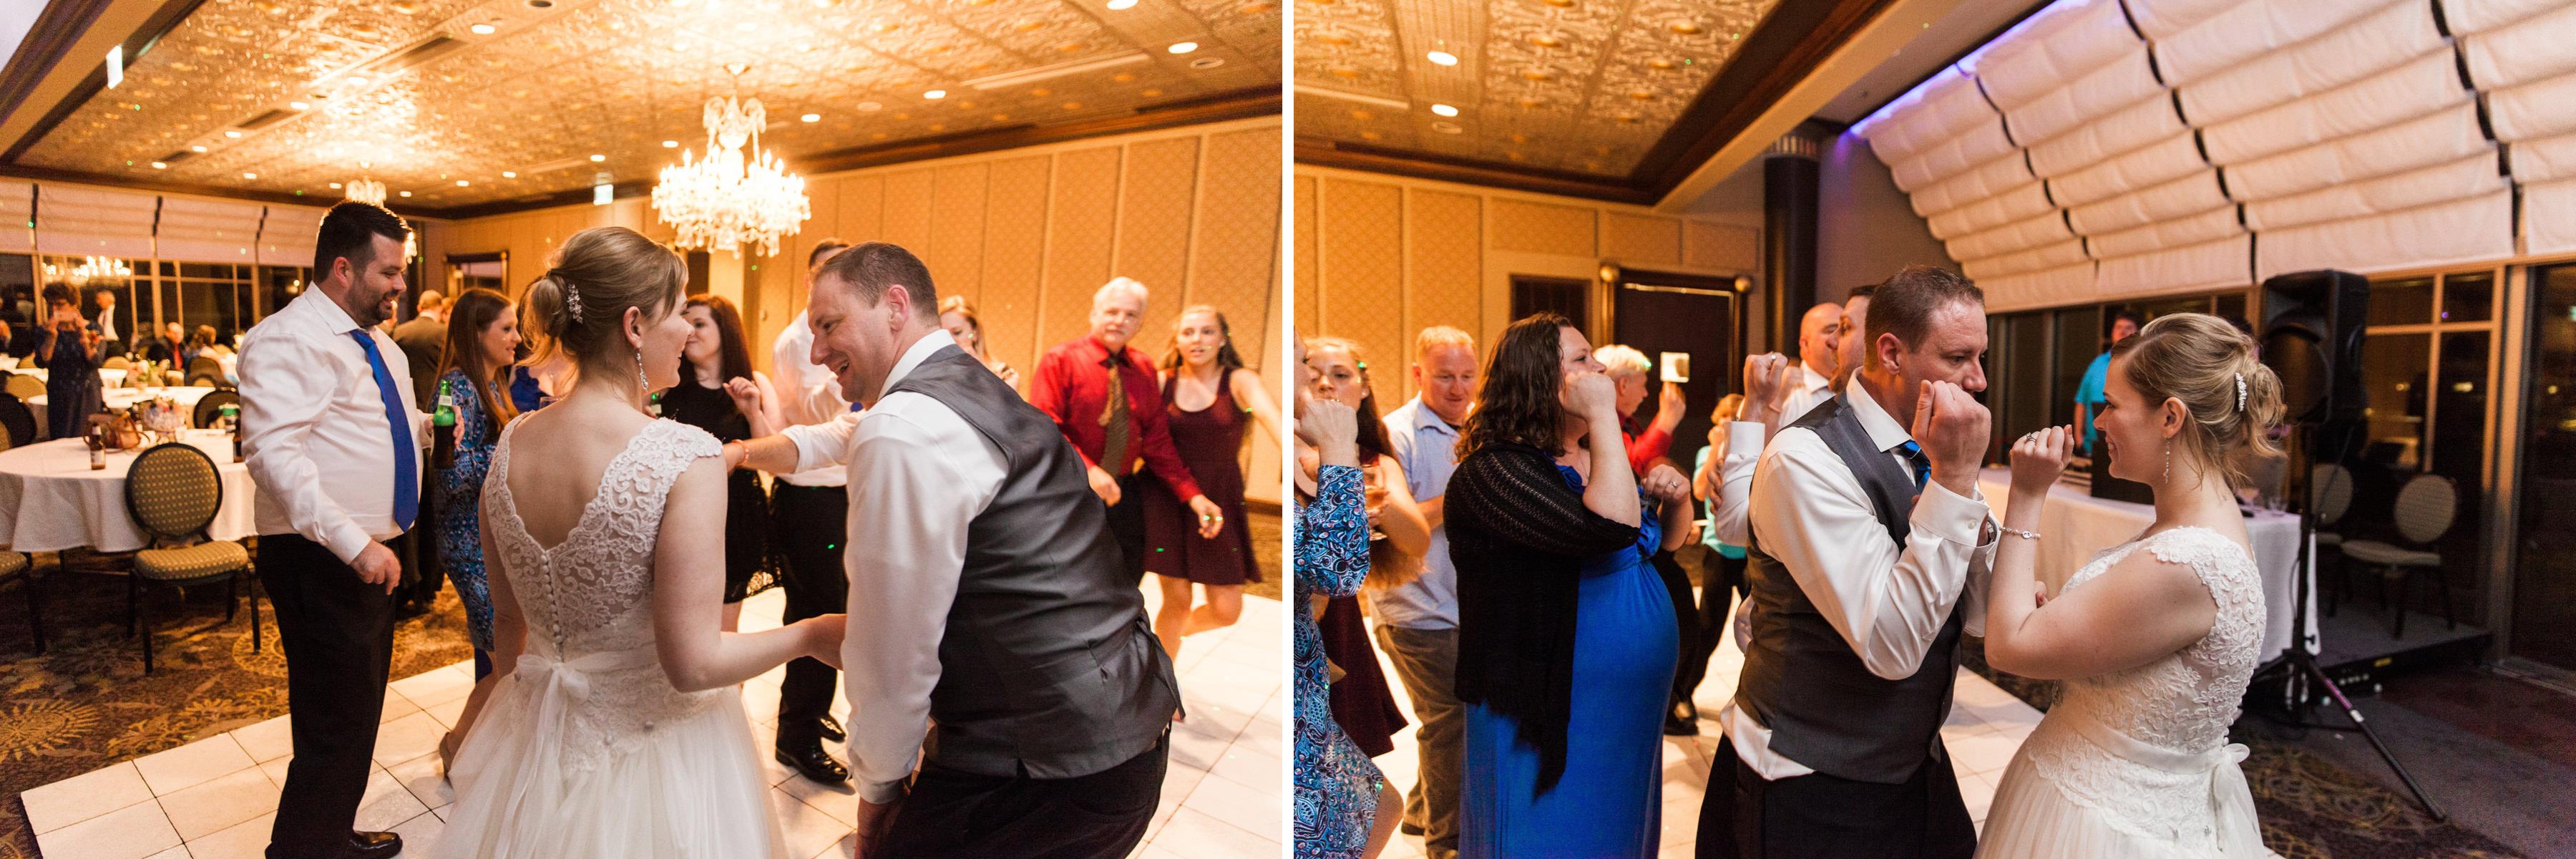 MAULDIN_WEDDING_MONTGOMERY_ALABAMA_WEDDING_PHOTOGRAPHY_132